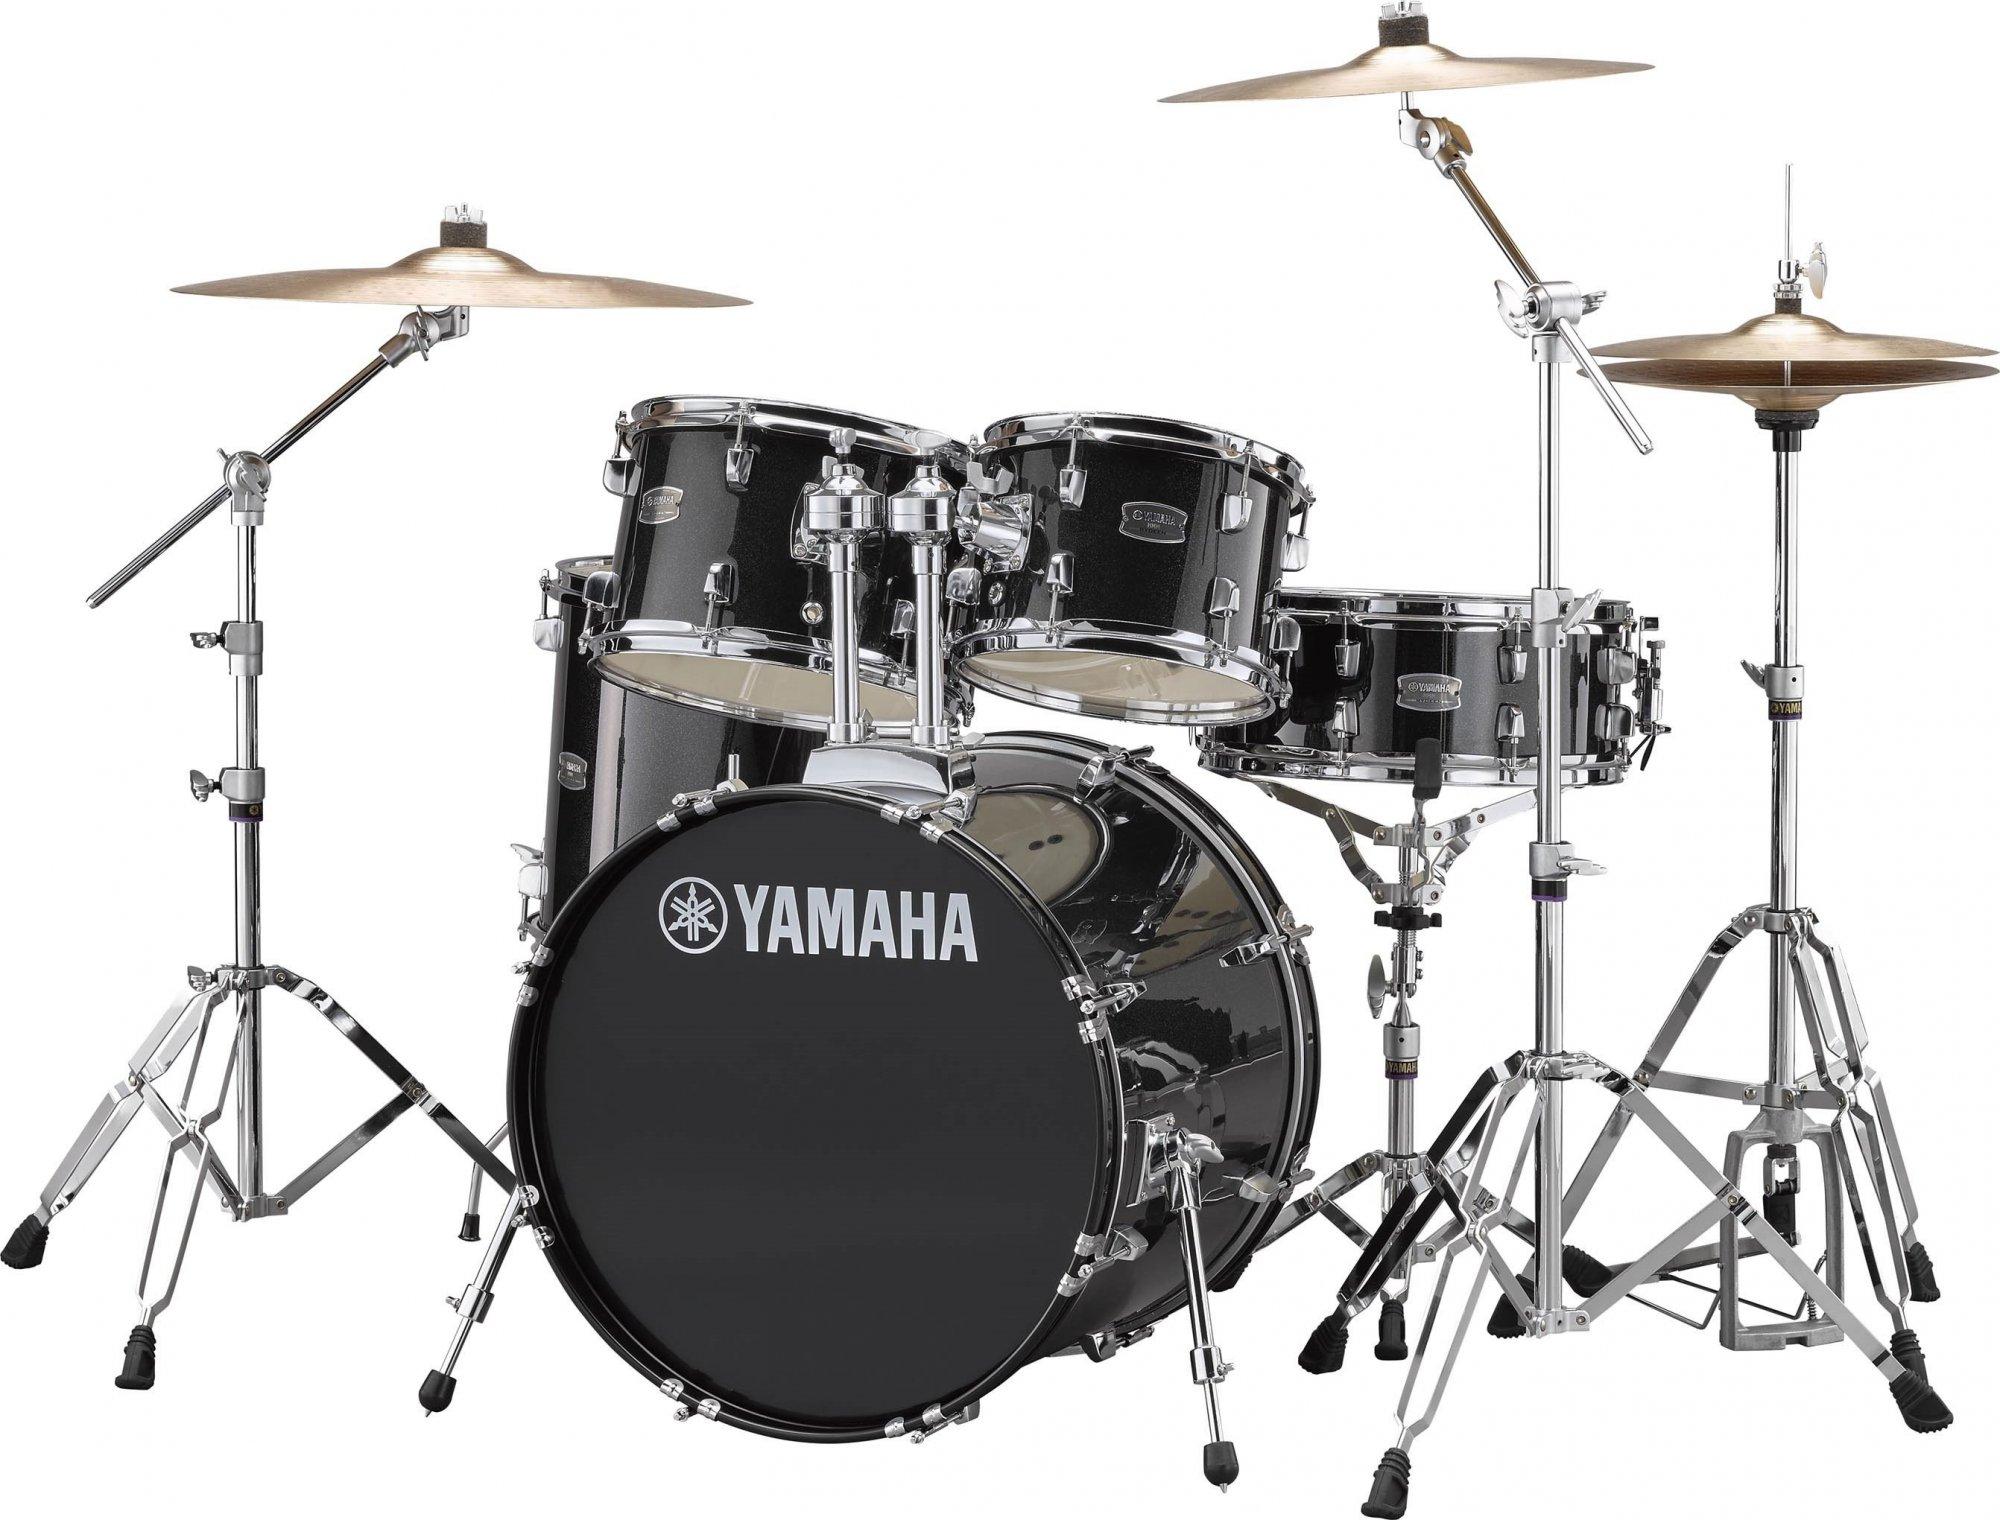 Yamaha RDP0F5 Rydeen 5pc (Shell Pack) Acoustic Drum Kit - Black Glitter